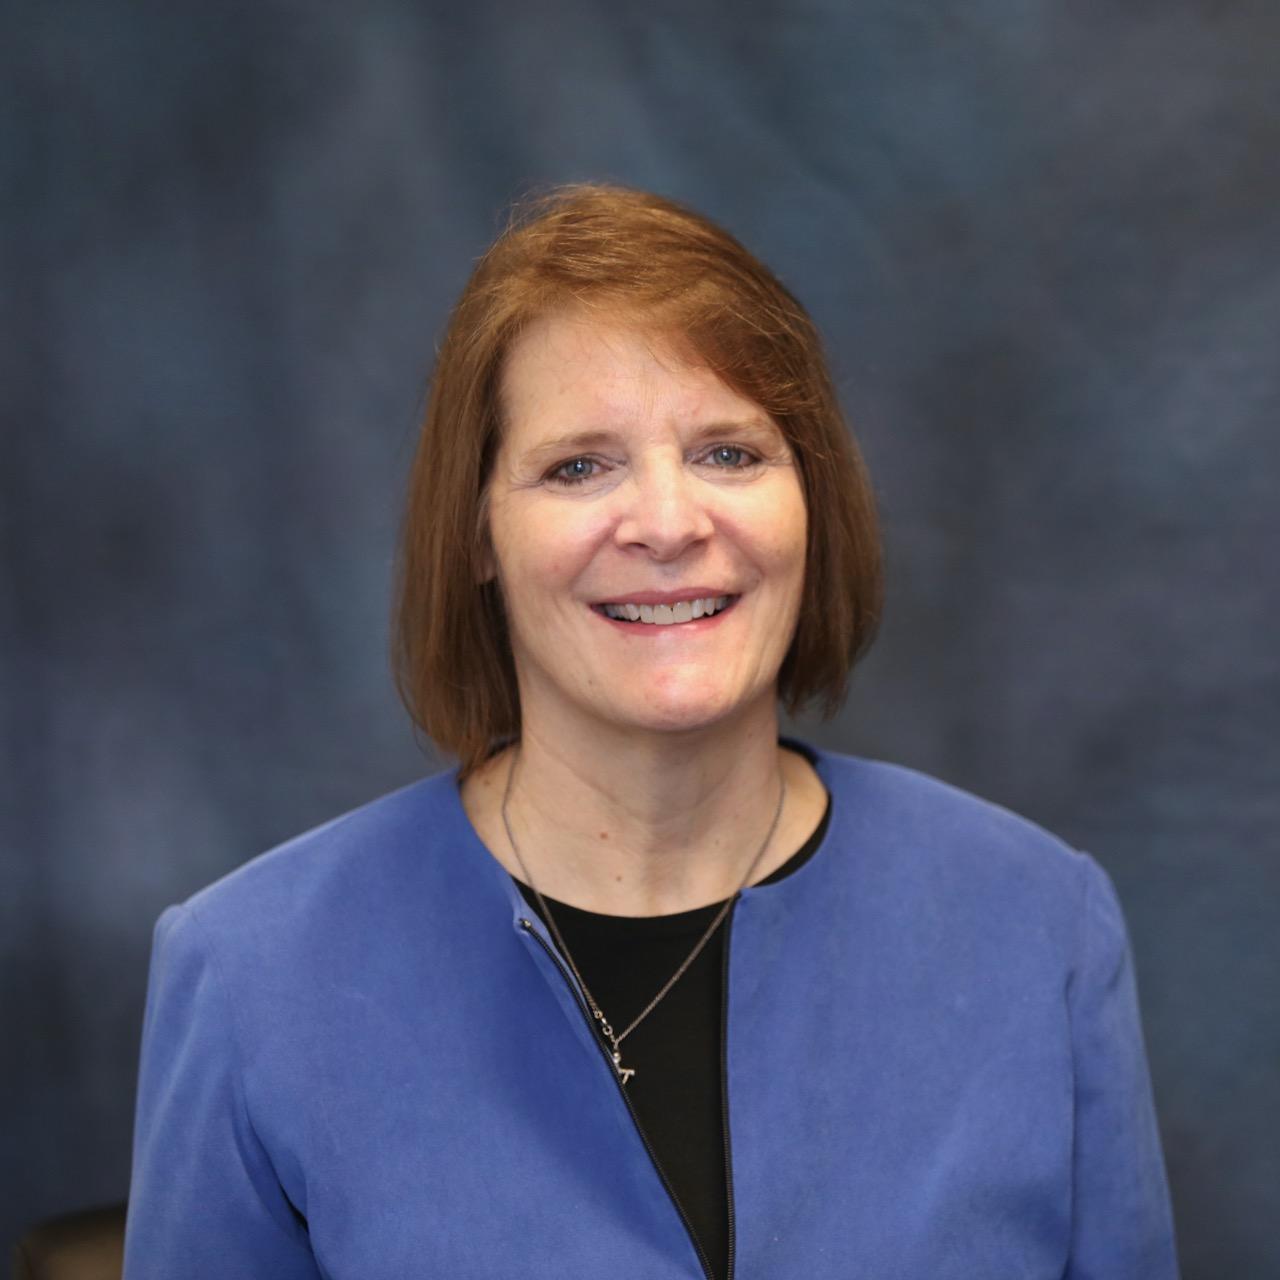 Mary Murrin